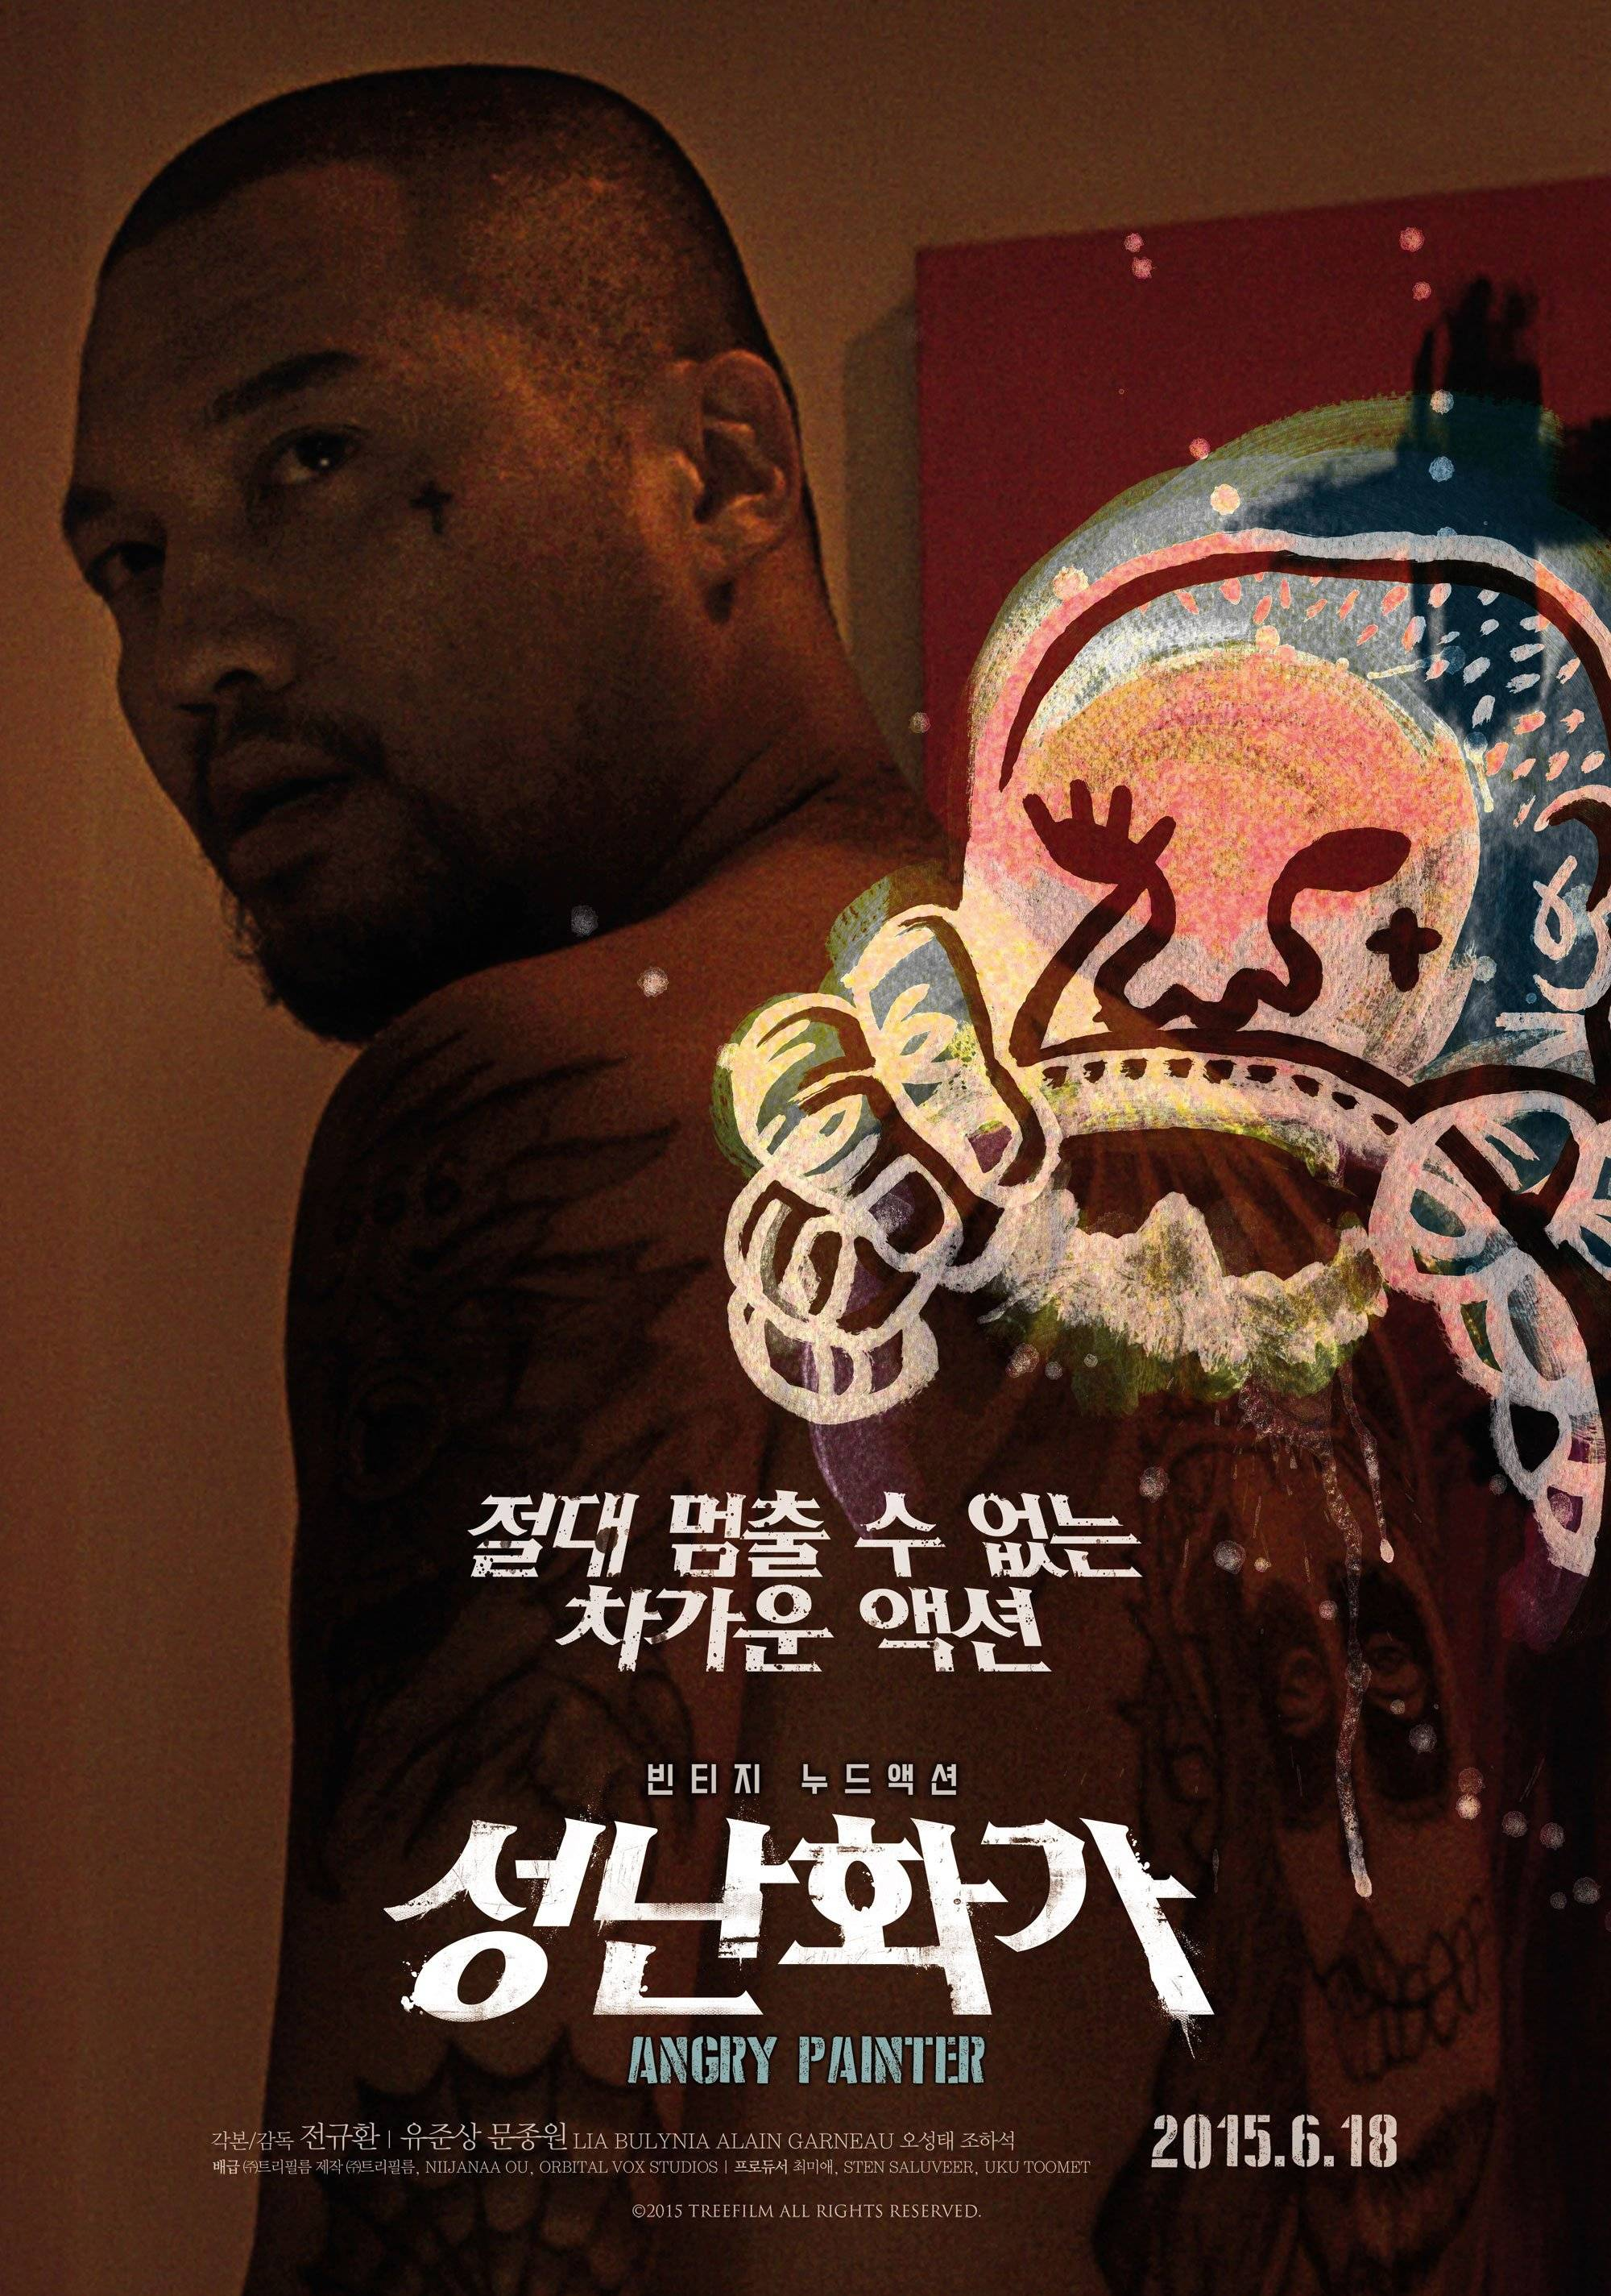 Angry Painter Watch Online angry painter (korean movie - 2014) - 성난 화가 @ hancinema